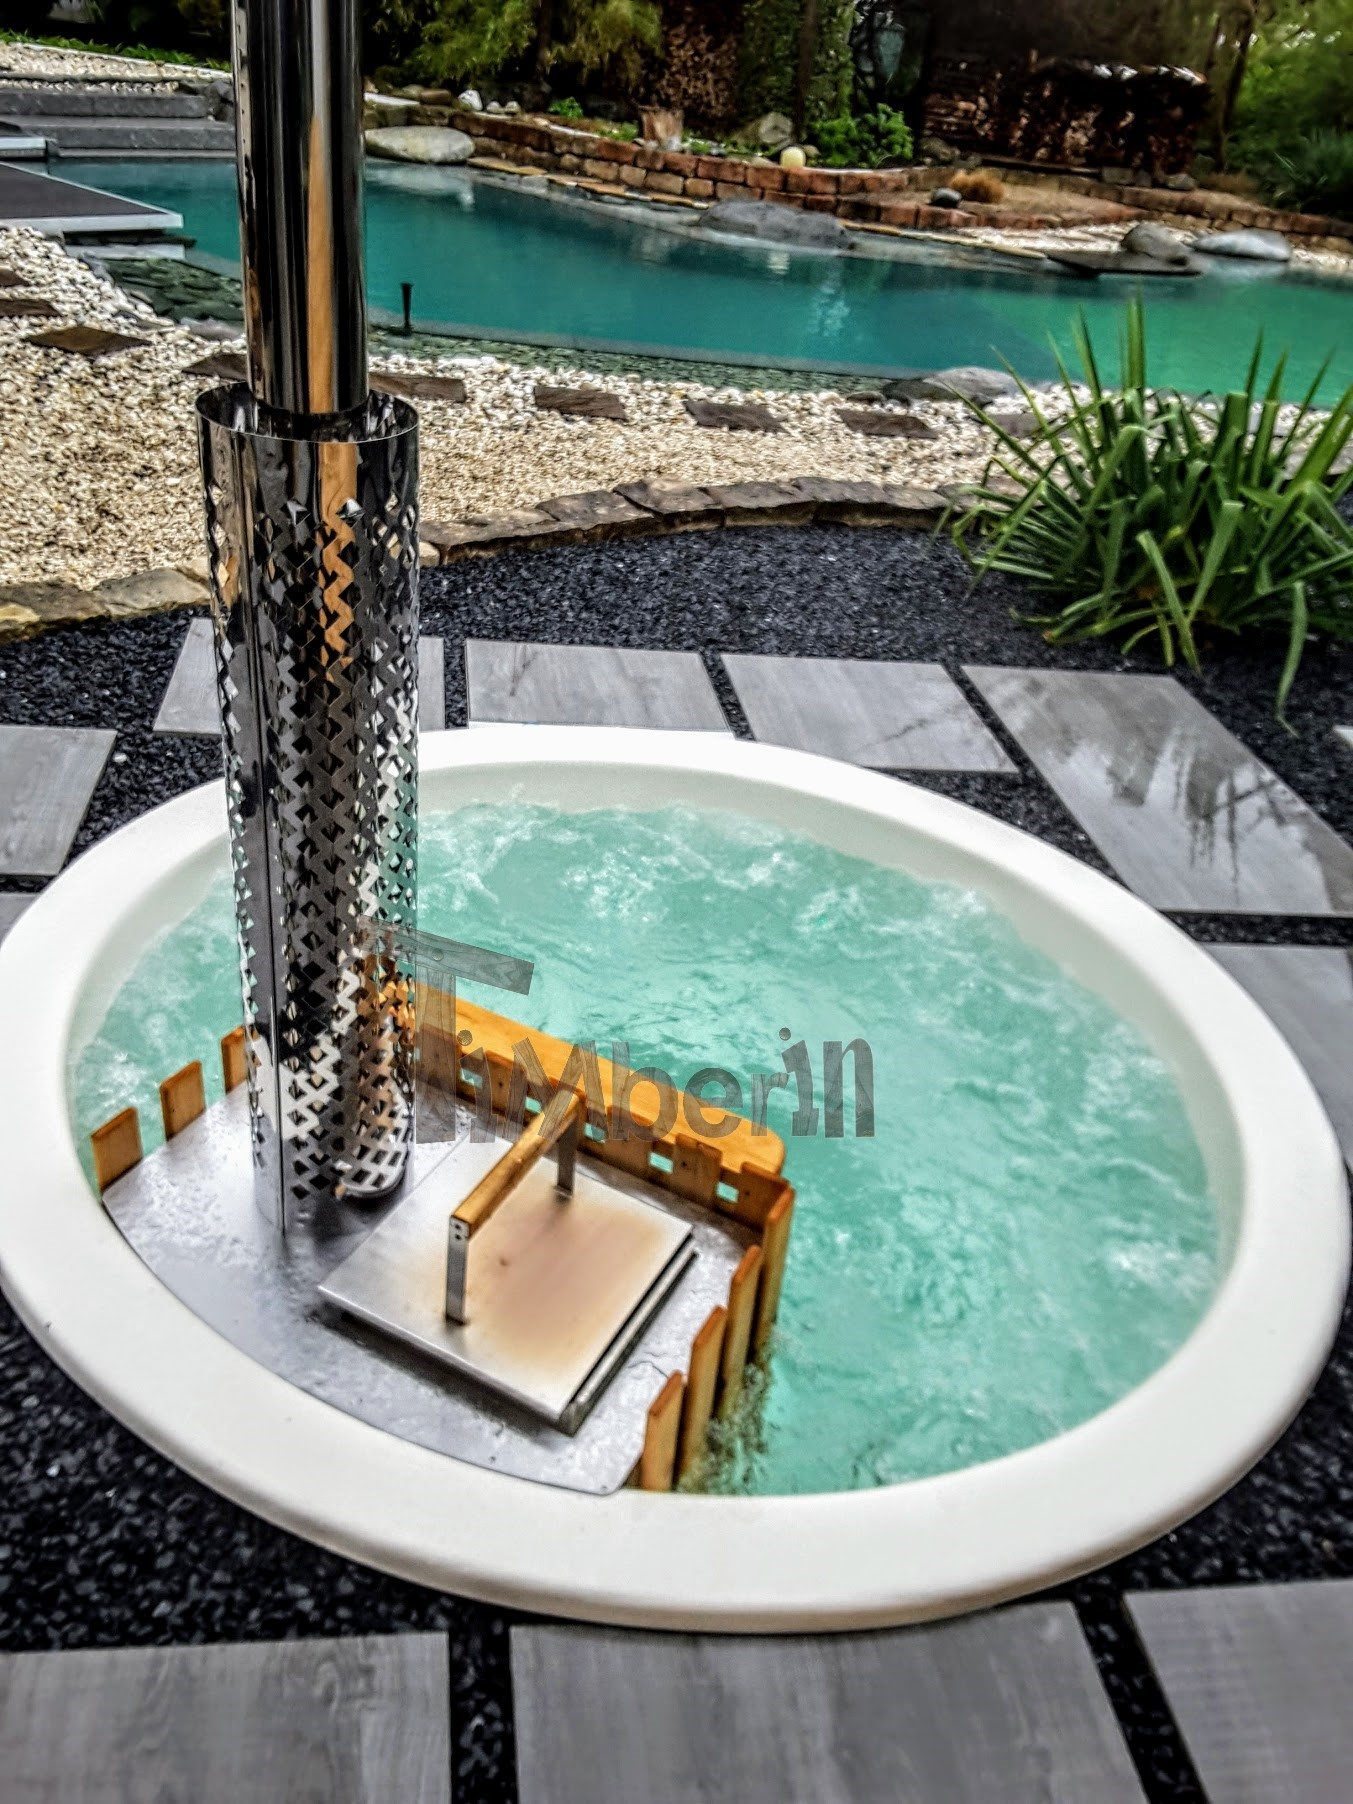 Sunken Built In Patio Hot Tub Jacuzzi Terrace Model (4)